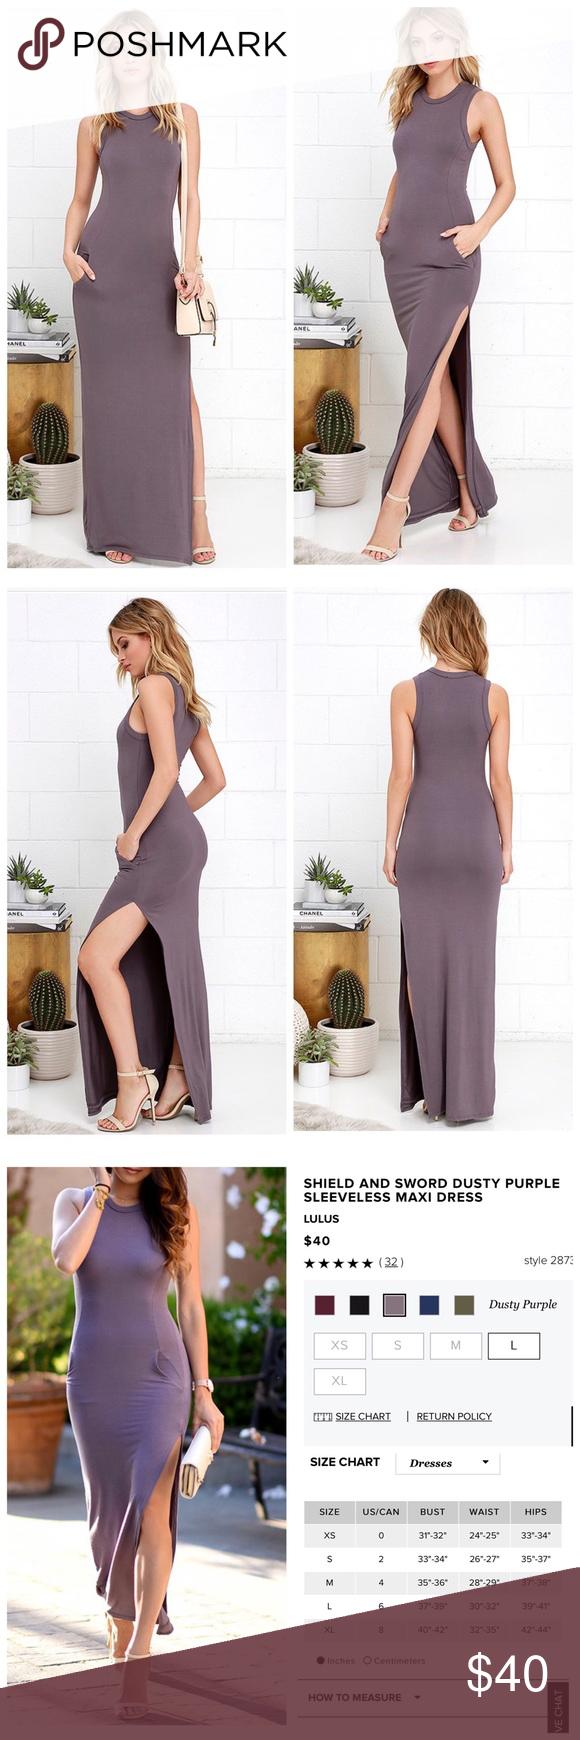 7041a0d73d Lulu s maxi dress NWOT Lulu s shield  amp  sword dusty purple sleeveless  maxi dress. Amazing